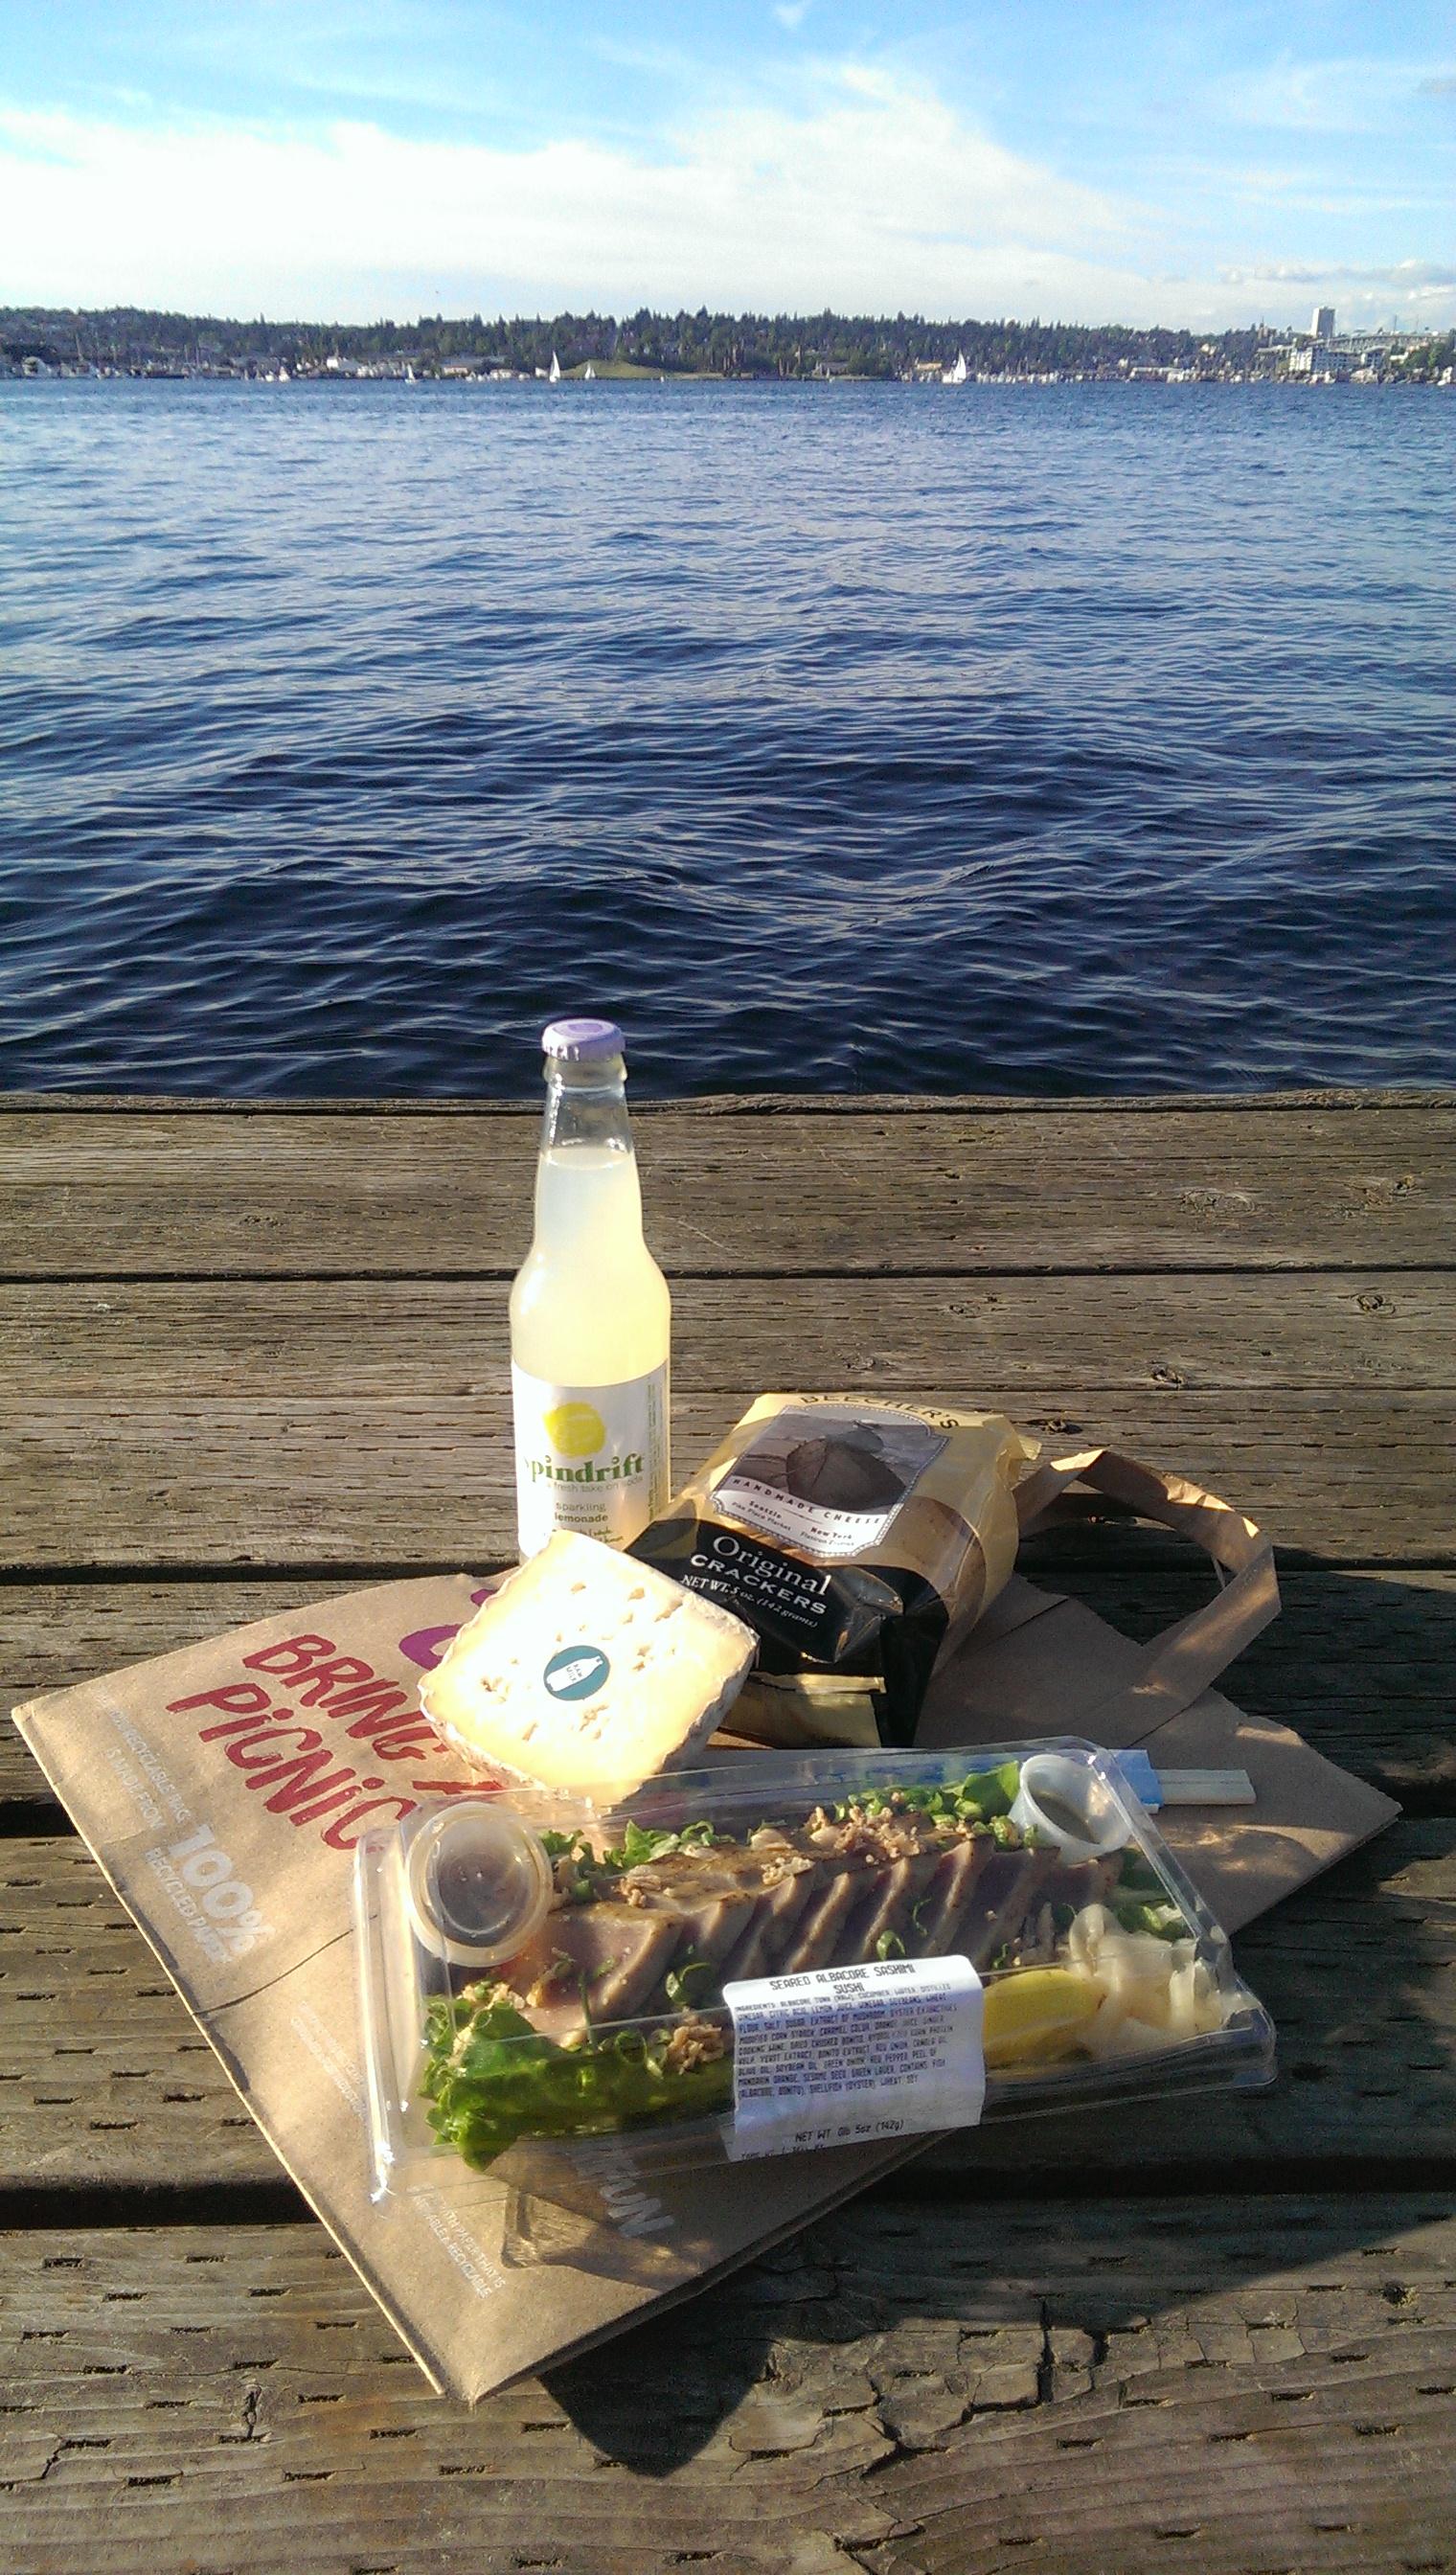 37 - Whole Foods picnic on South Lake Union